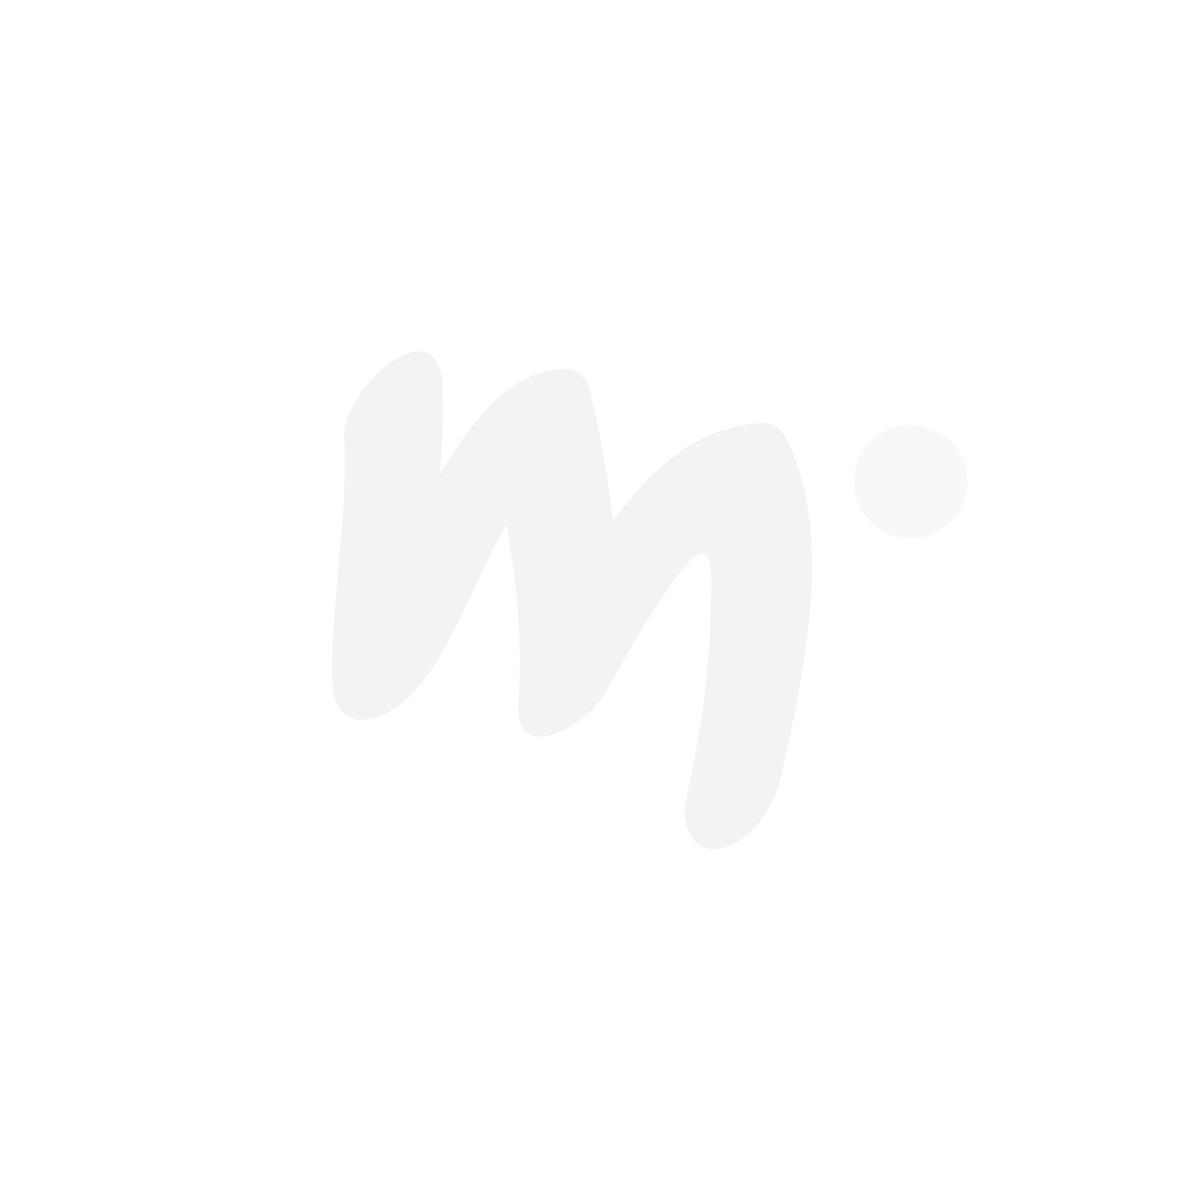 Tomy Mustekalat-kylpylelu